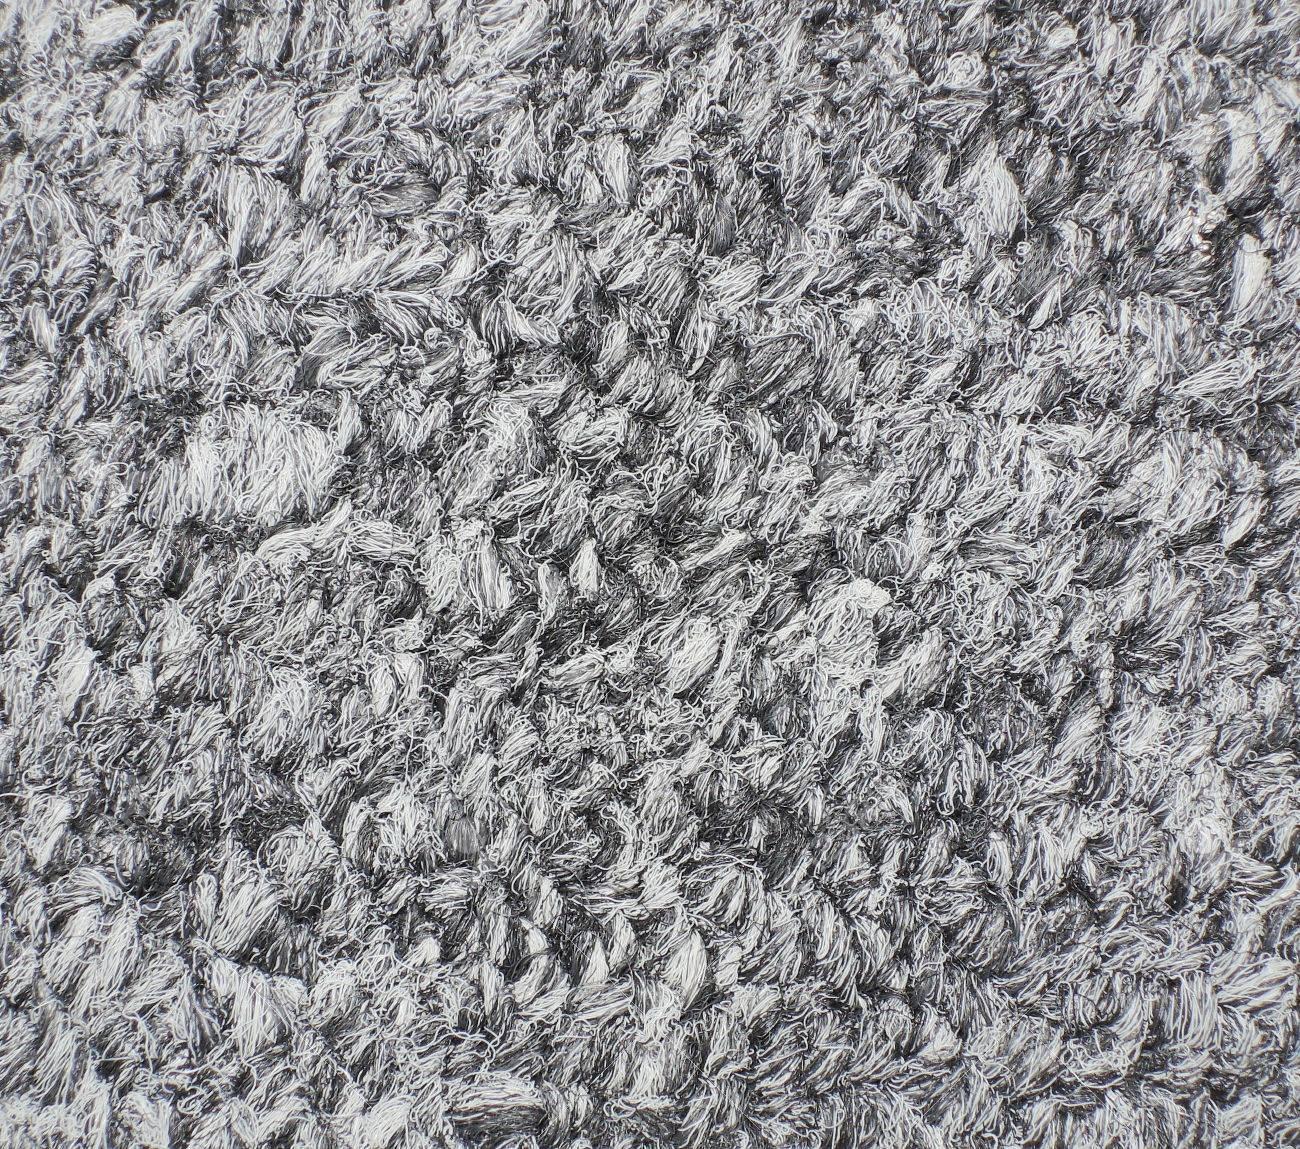 grey carpet texture stock photo 38766789